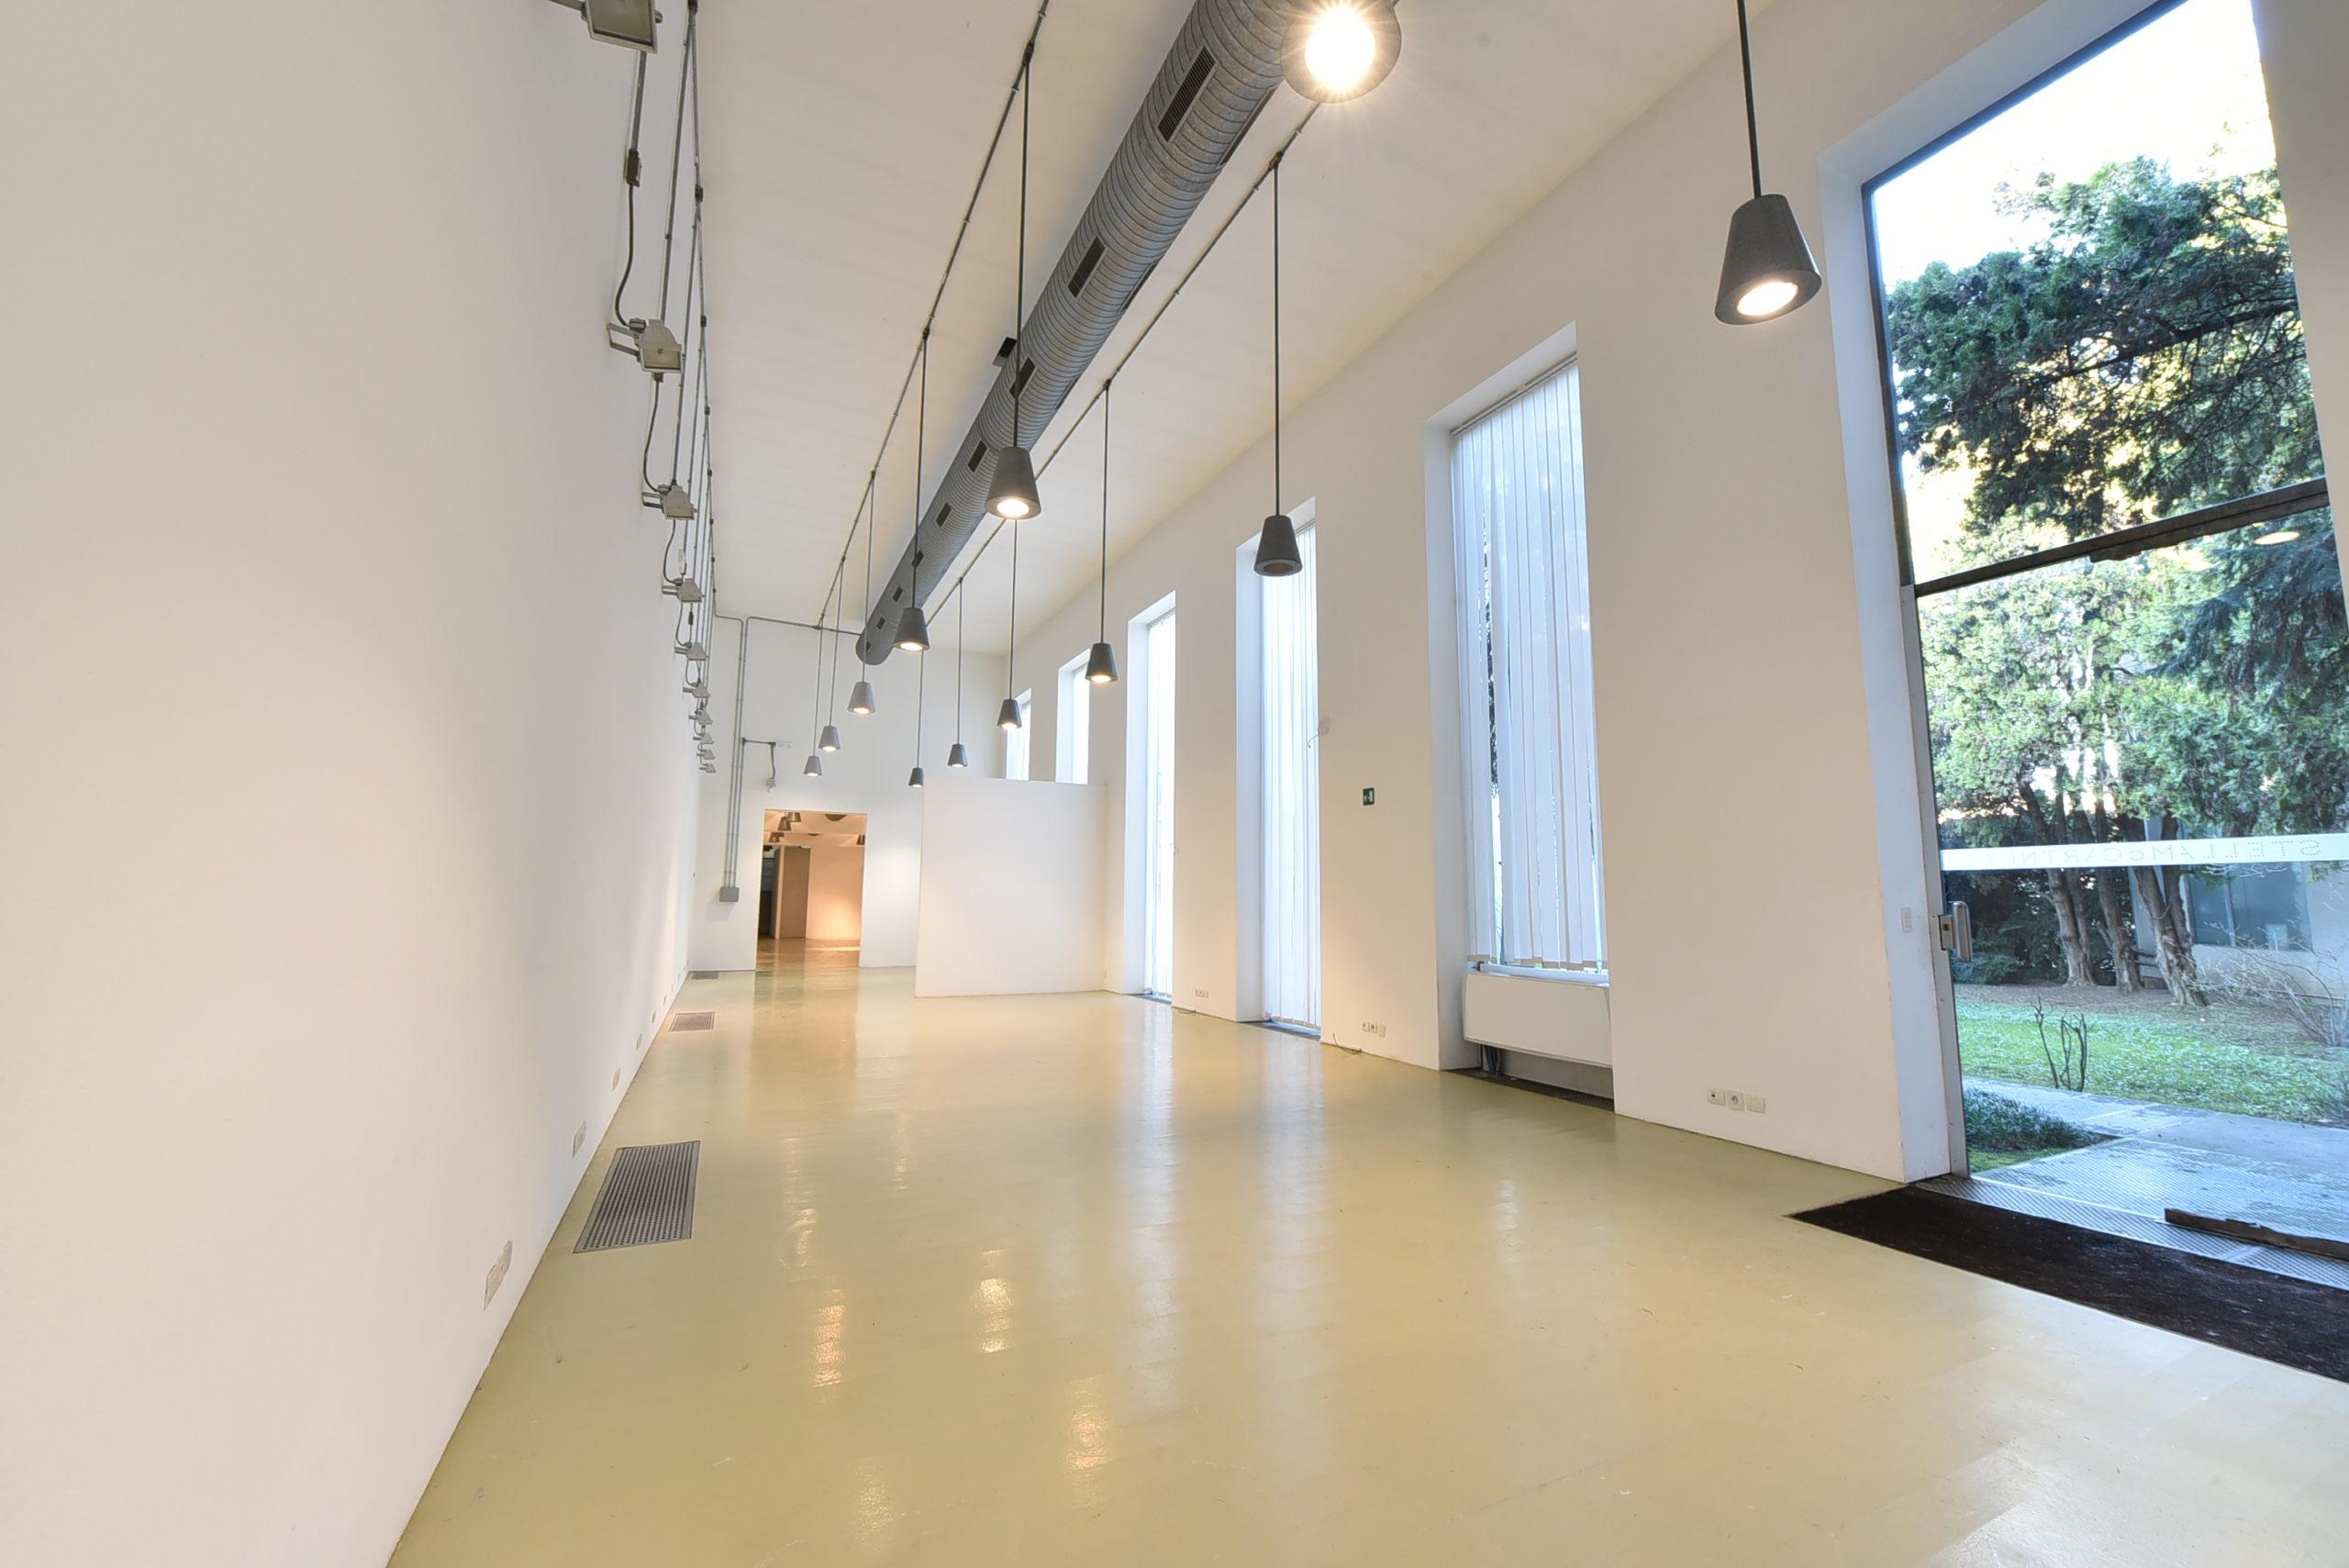 Ufficio – Show room – Architettura Minimale – Via Tortona